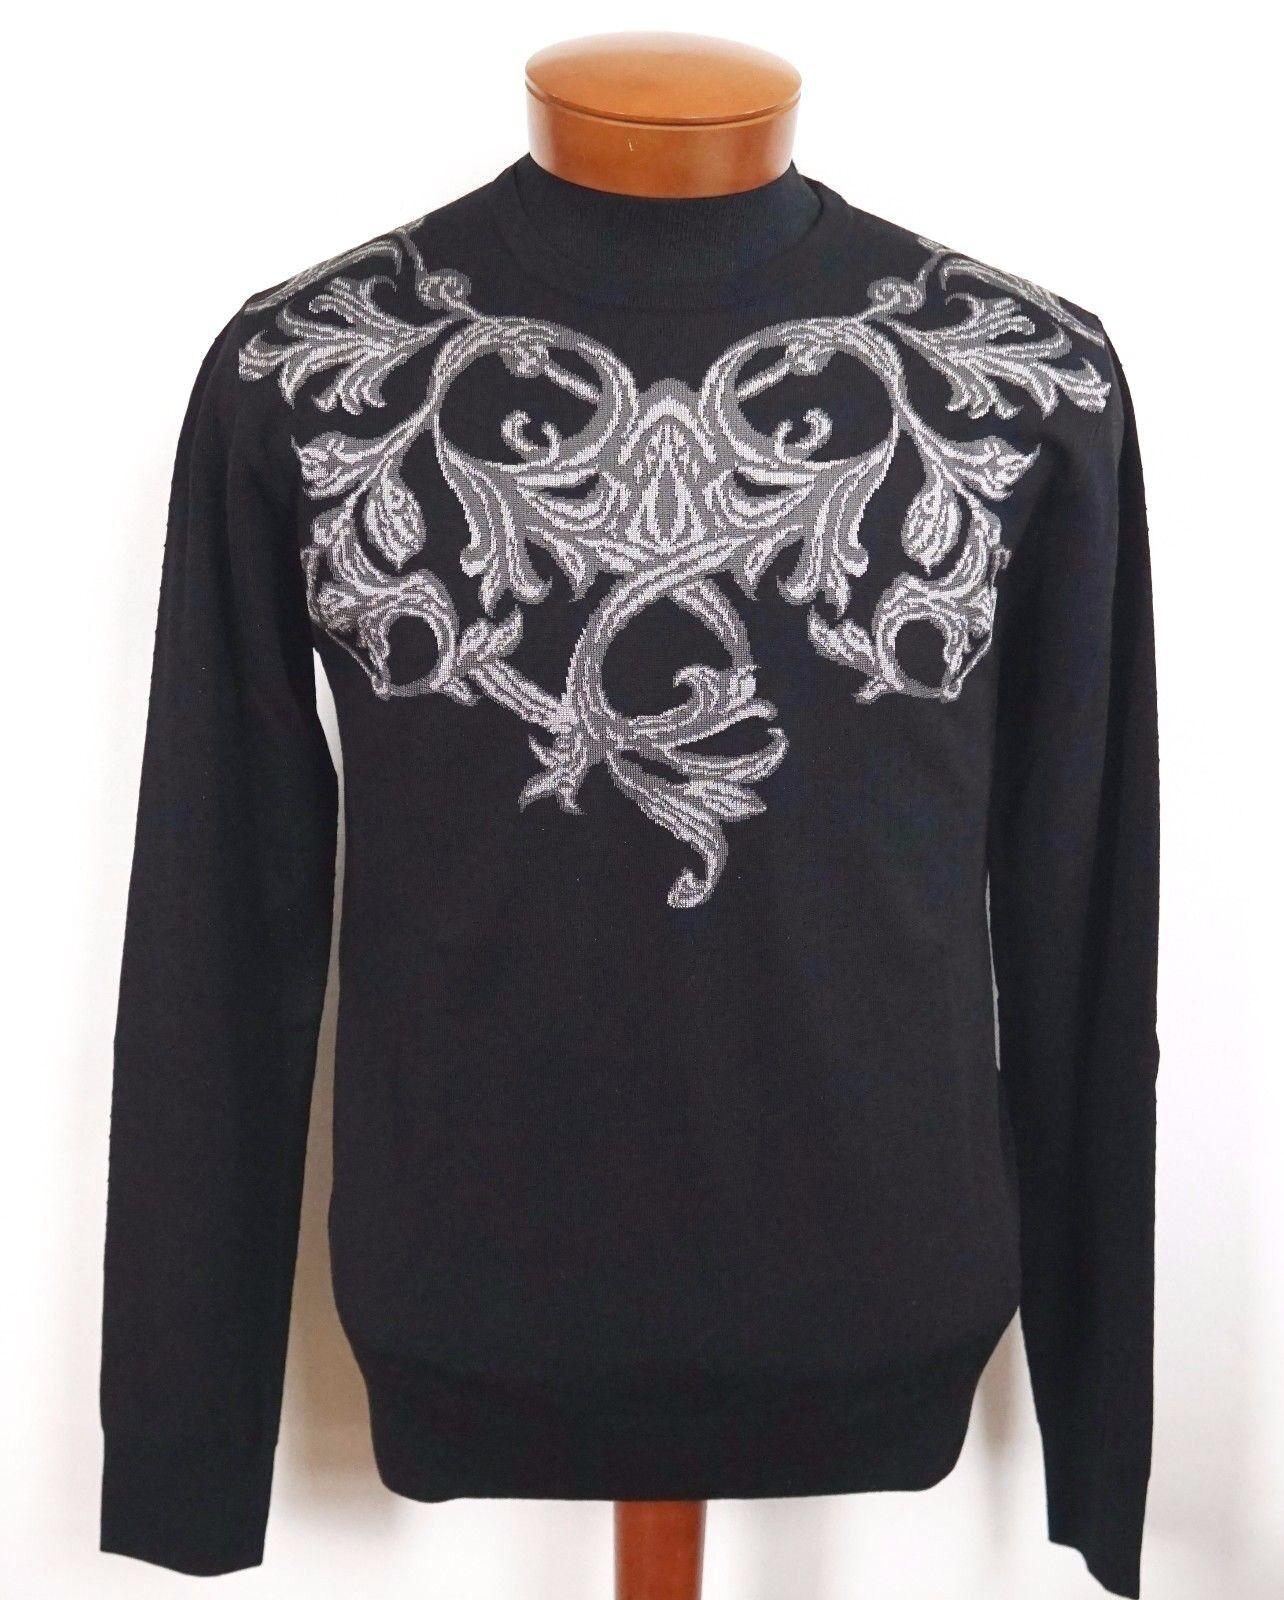 775 NWT VERSACE BAROQUE Wool Knitted Sweater IT-48/M IT-56/XL IT-58/2XL